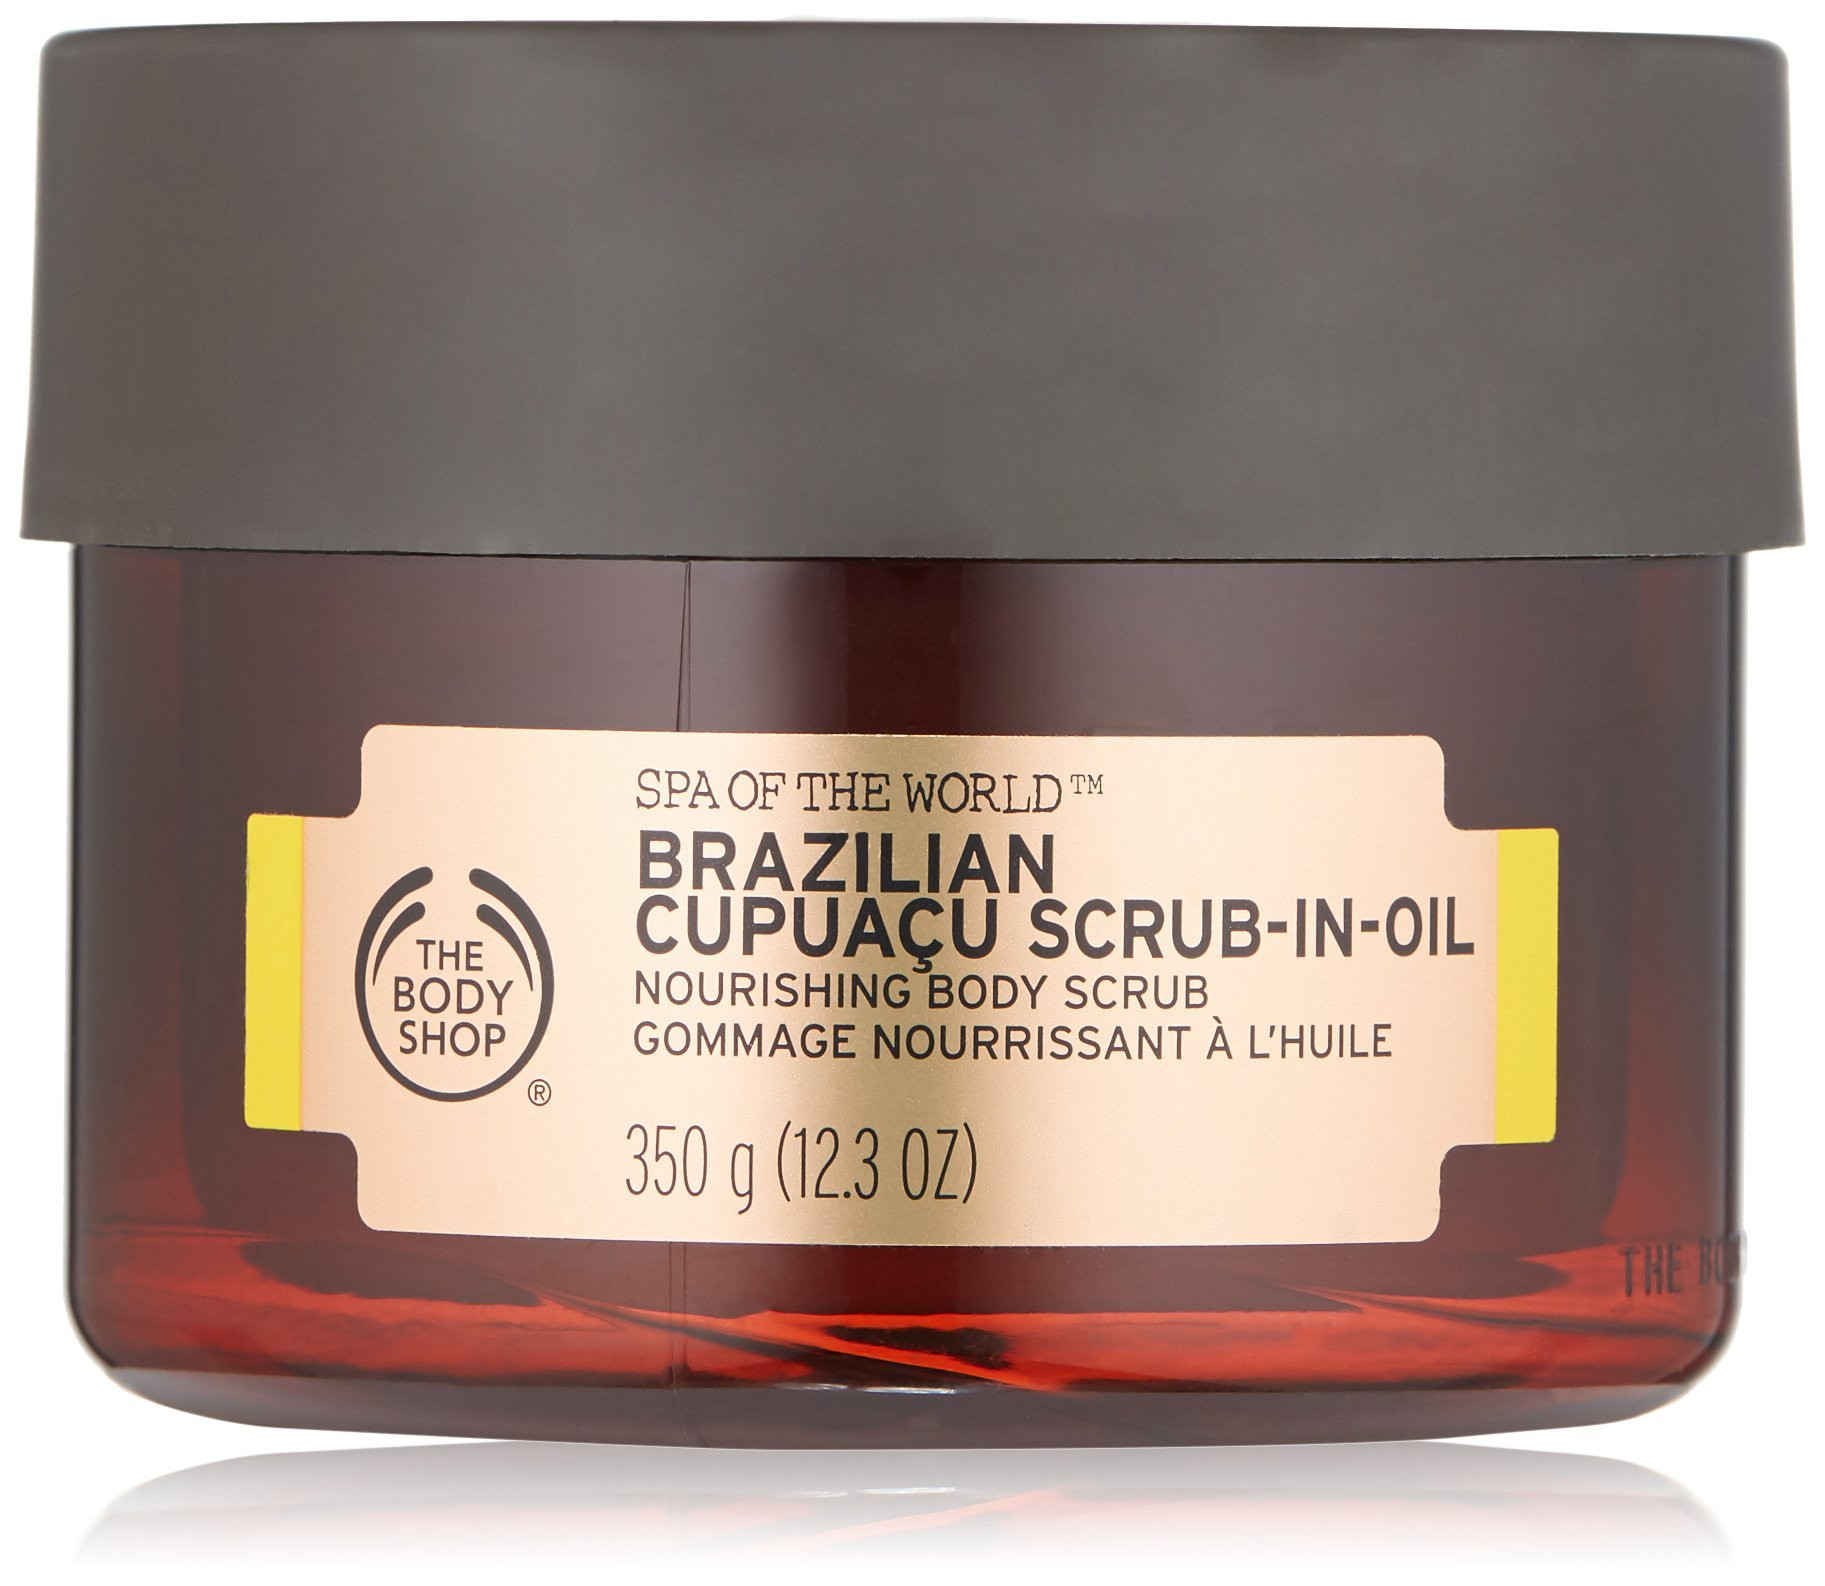 The Body Shop Spa of the World Brazilian Cupuacu Scrub-In-Oil, 12.3 Ounce